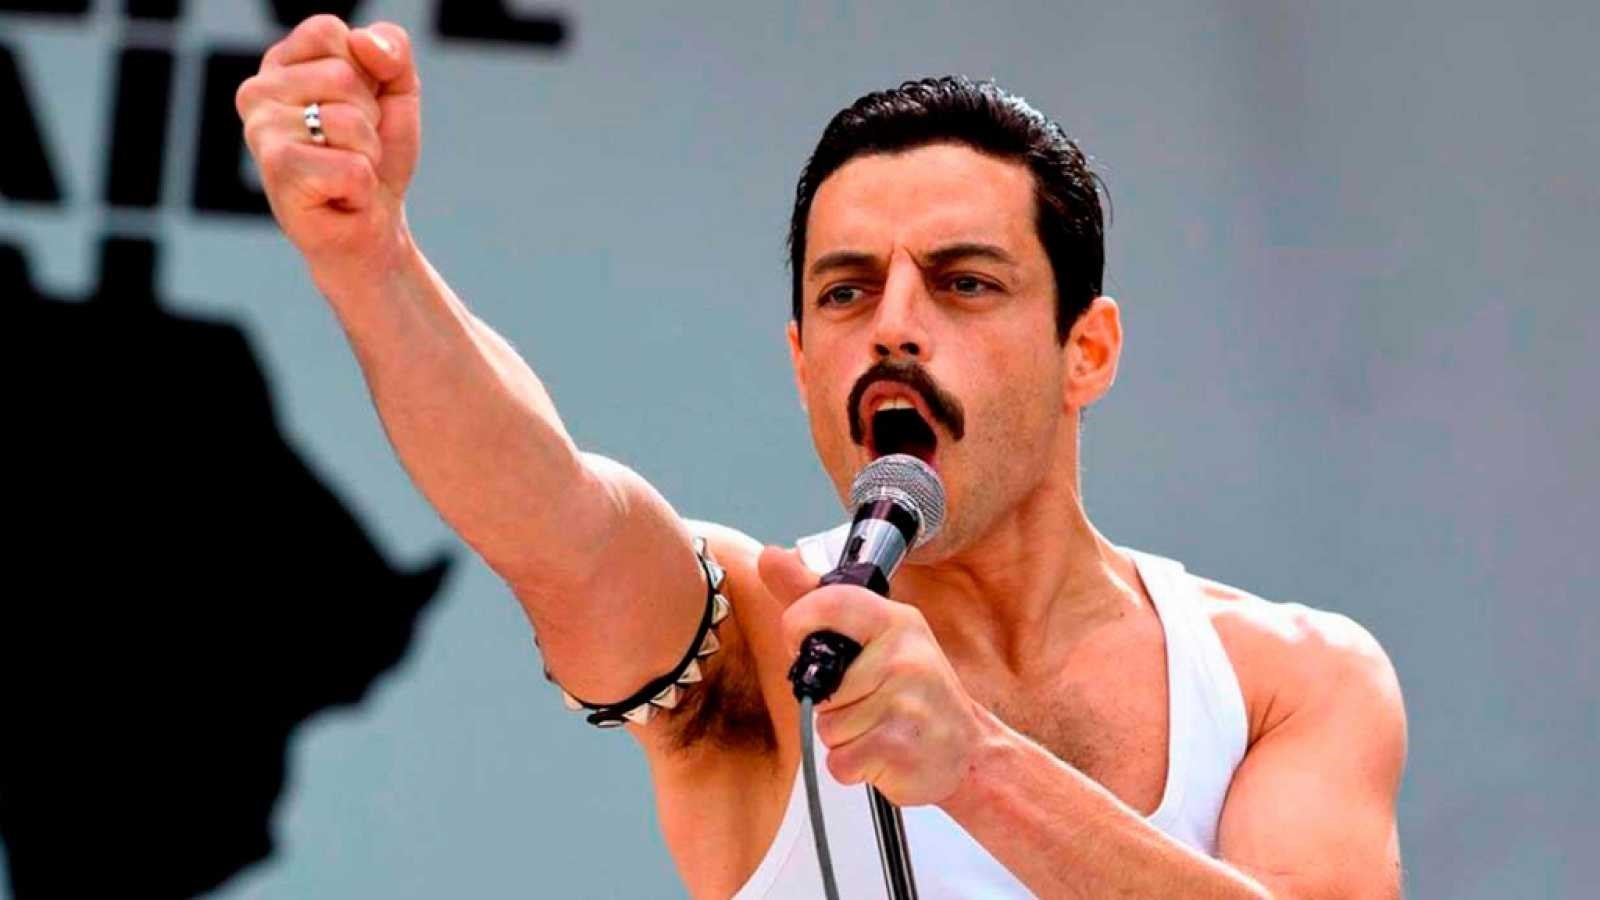 'Bohemian Rhapsody' · Bryan Singer / Dexter Fletcher